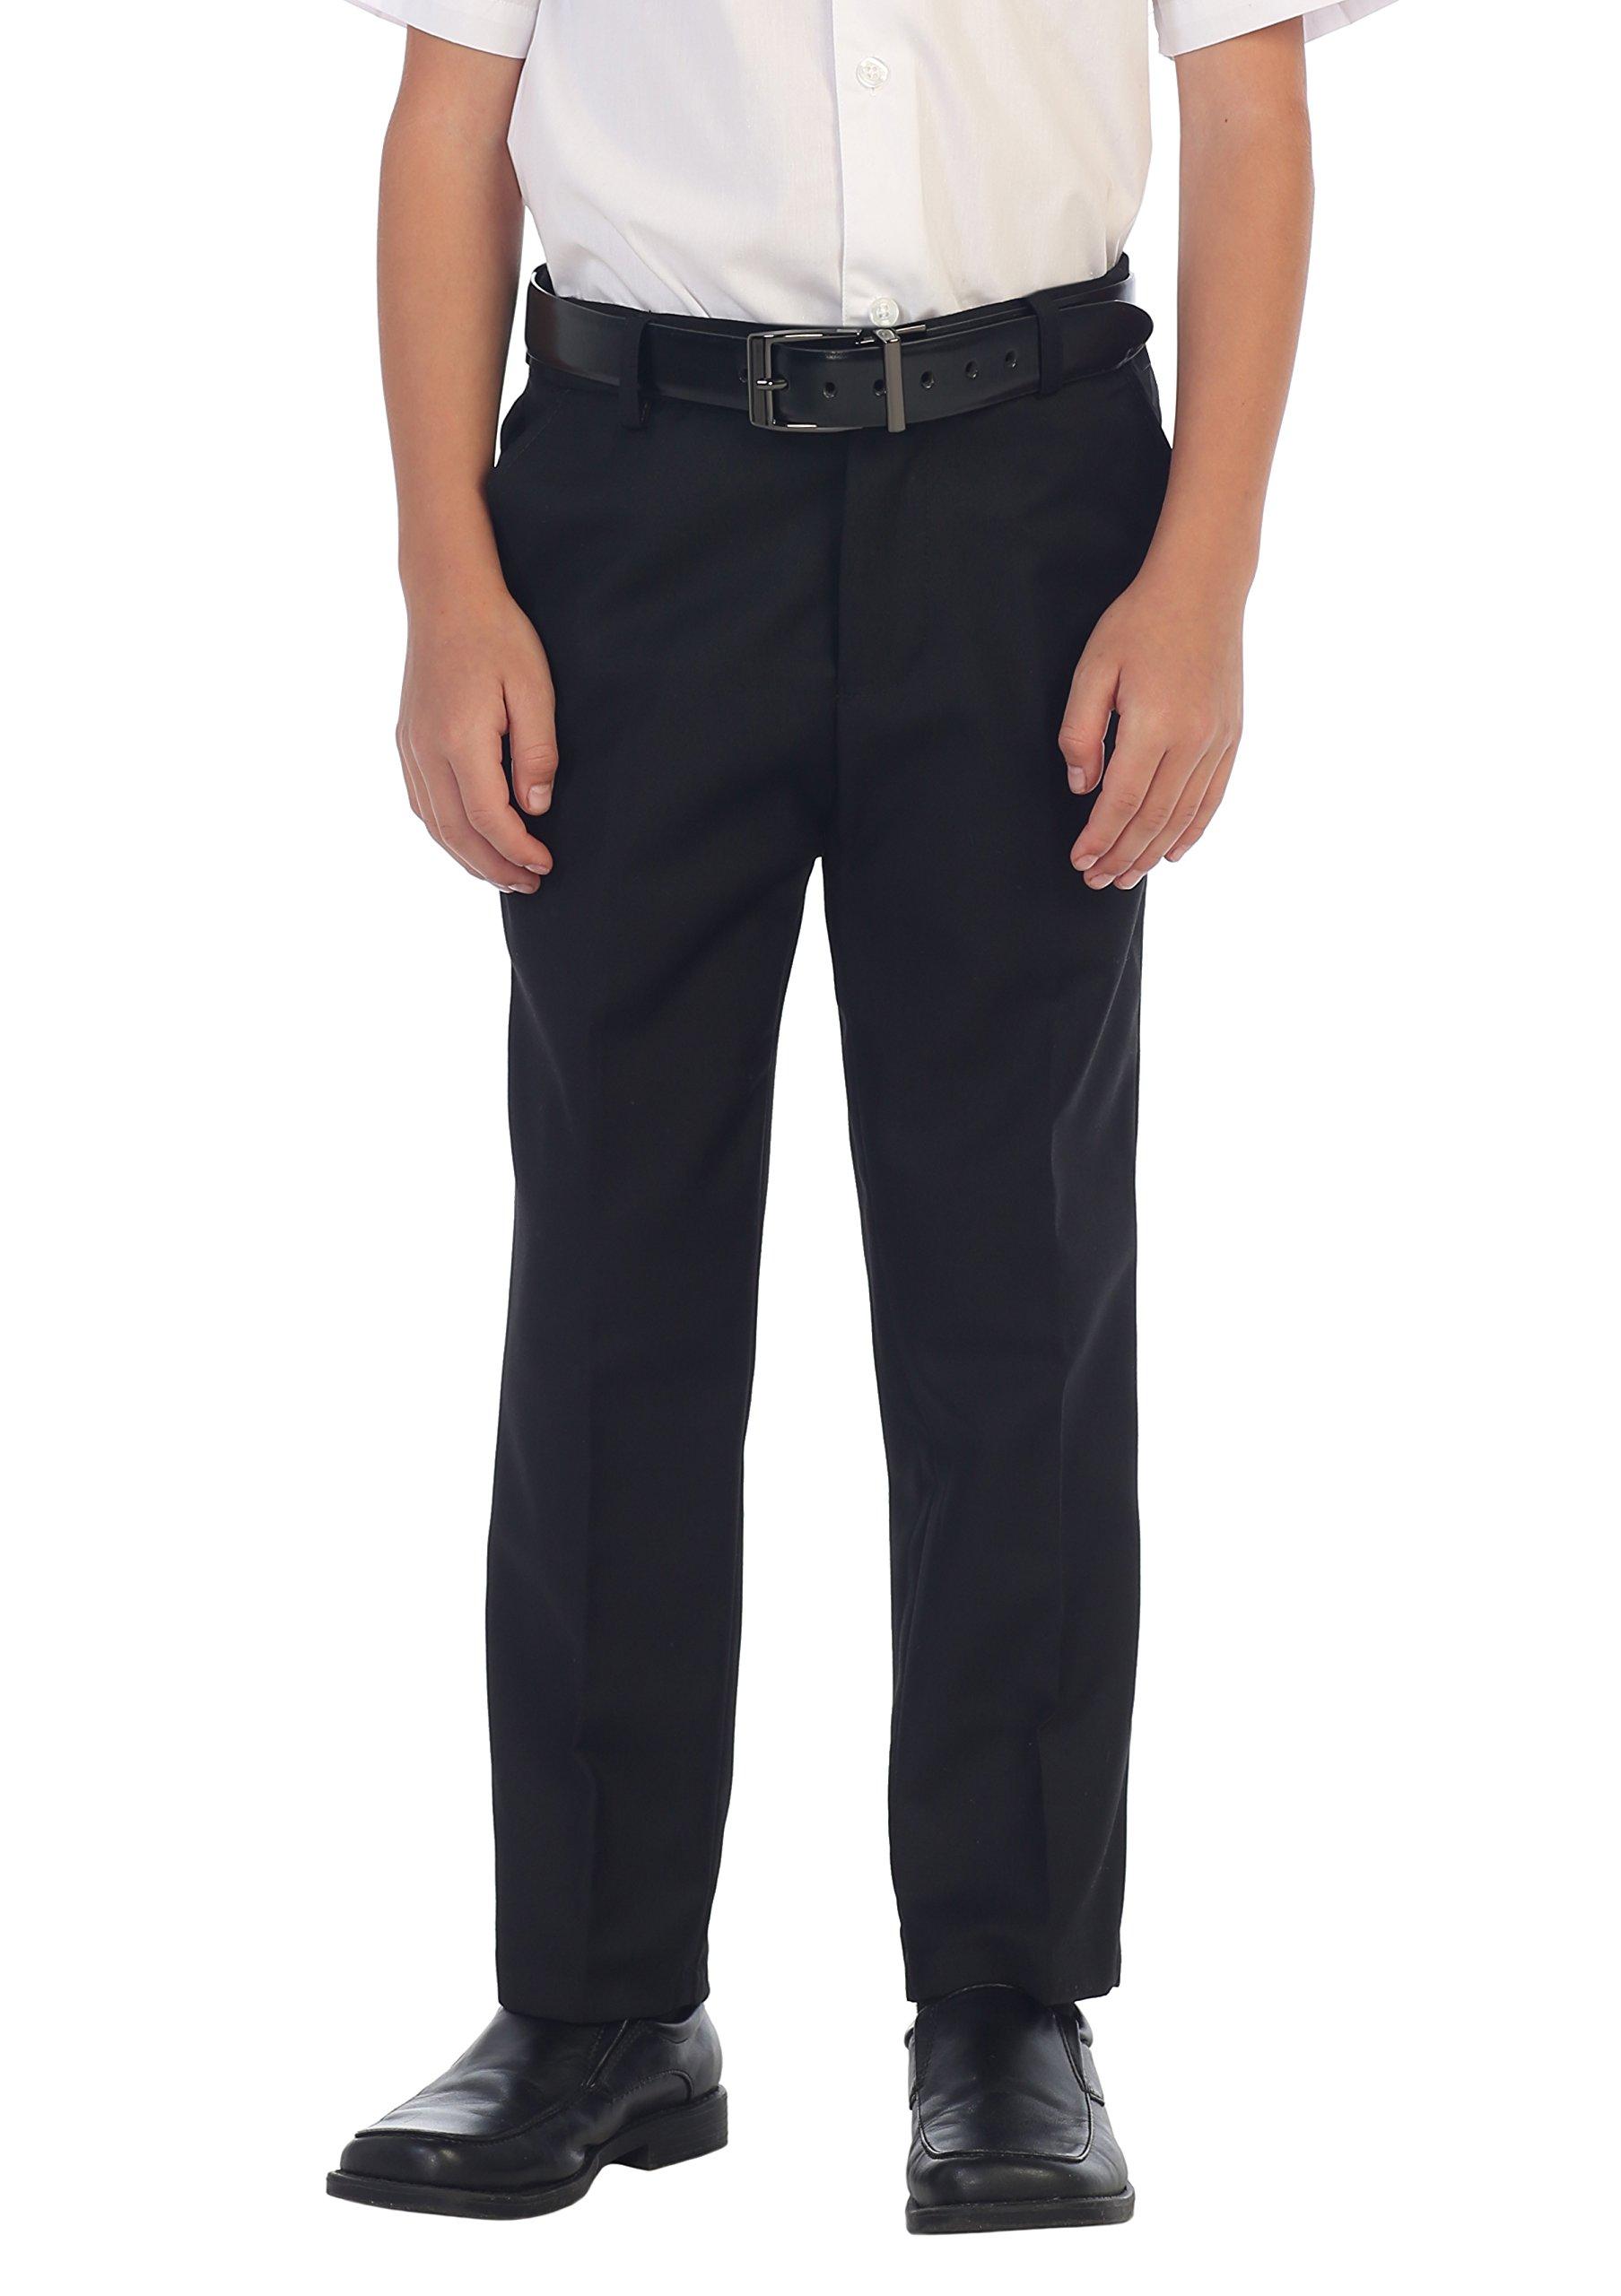 Gioberti Boys Flat Front Dress Pants, Black, 16